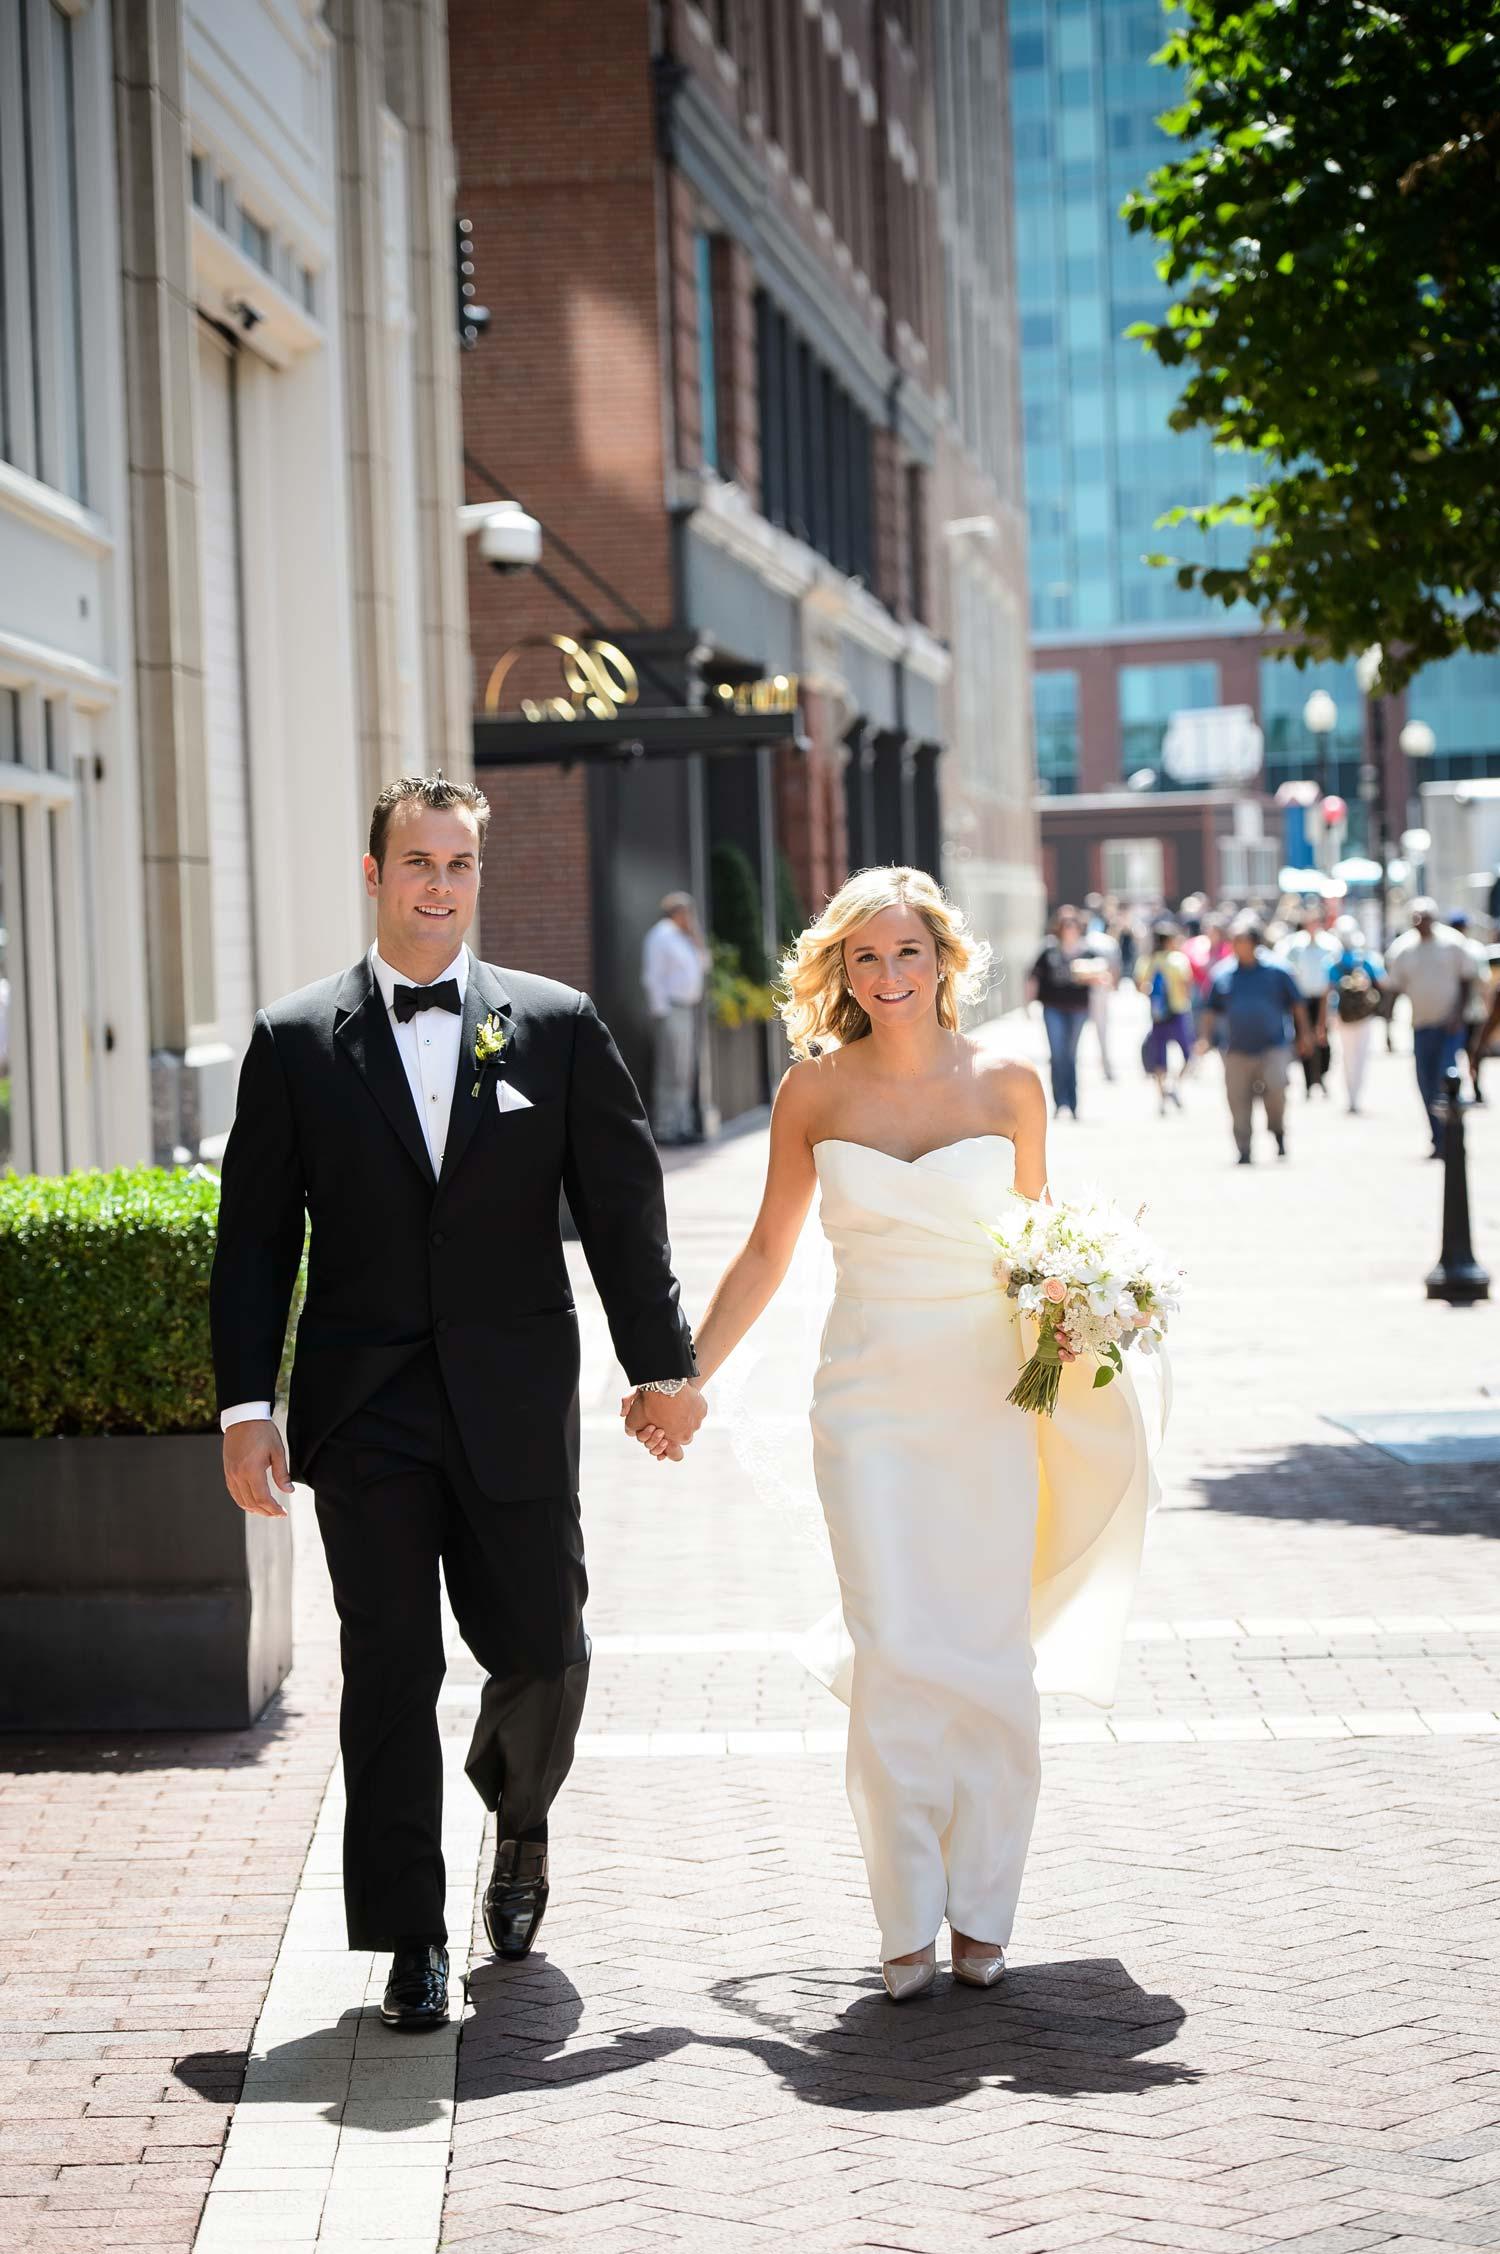 Summer City Wedding